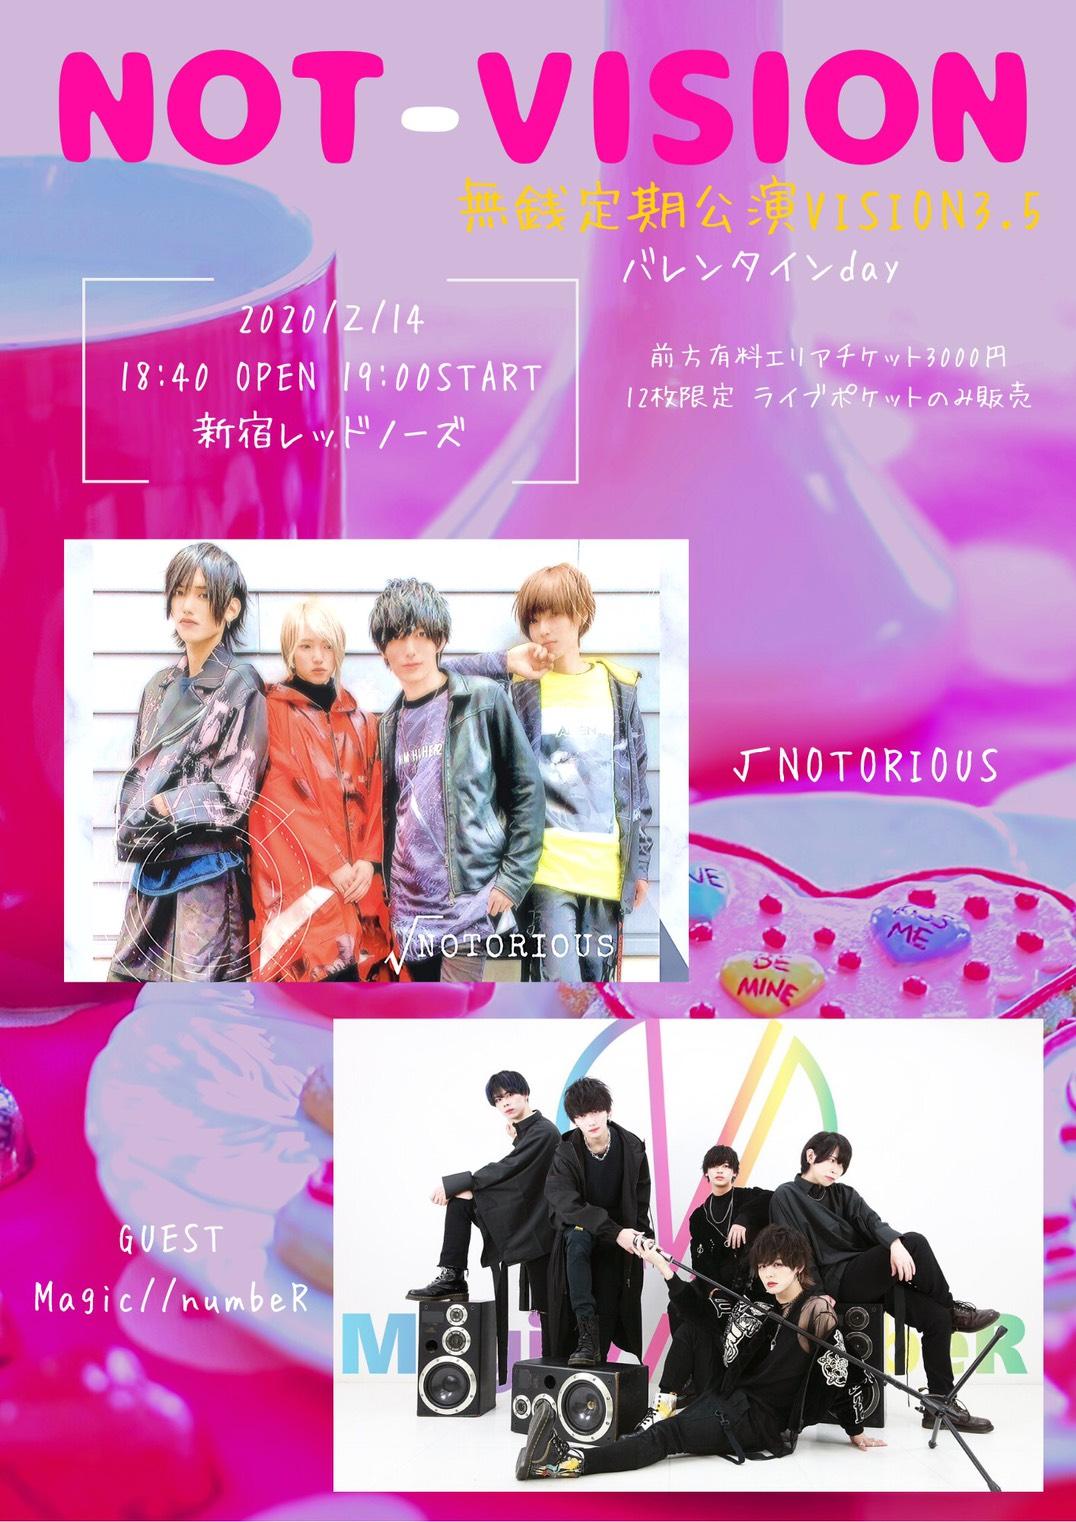 NOT-VISION無銭定期公演3.5~Magic//numbeR初登場!バレンタインday~